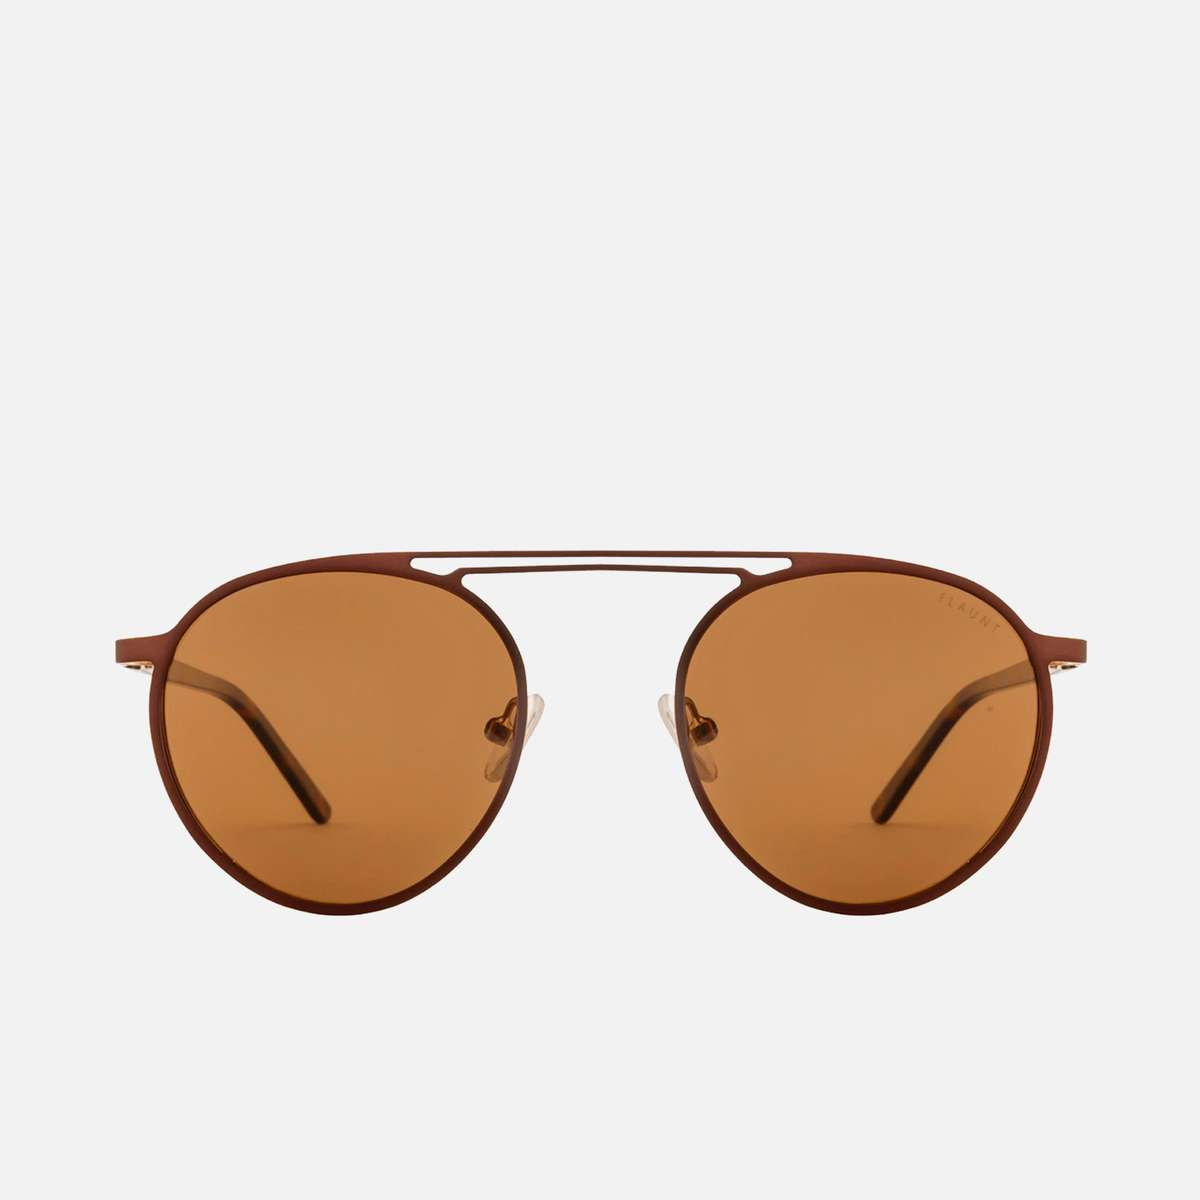 4.FEMINA FLAUNT Women UV-Protected Oval Sunglasses- 9002-C1